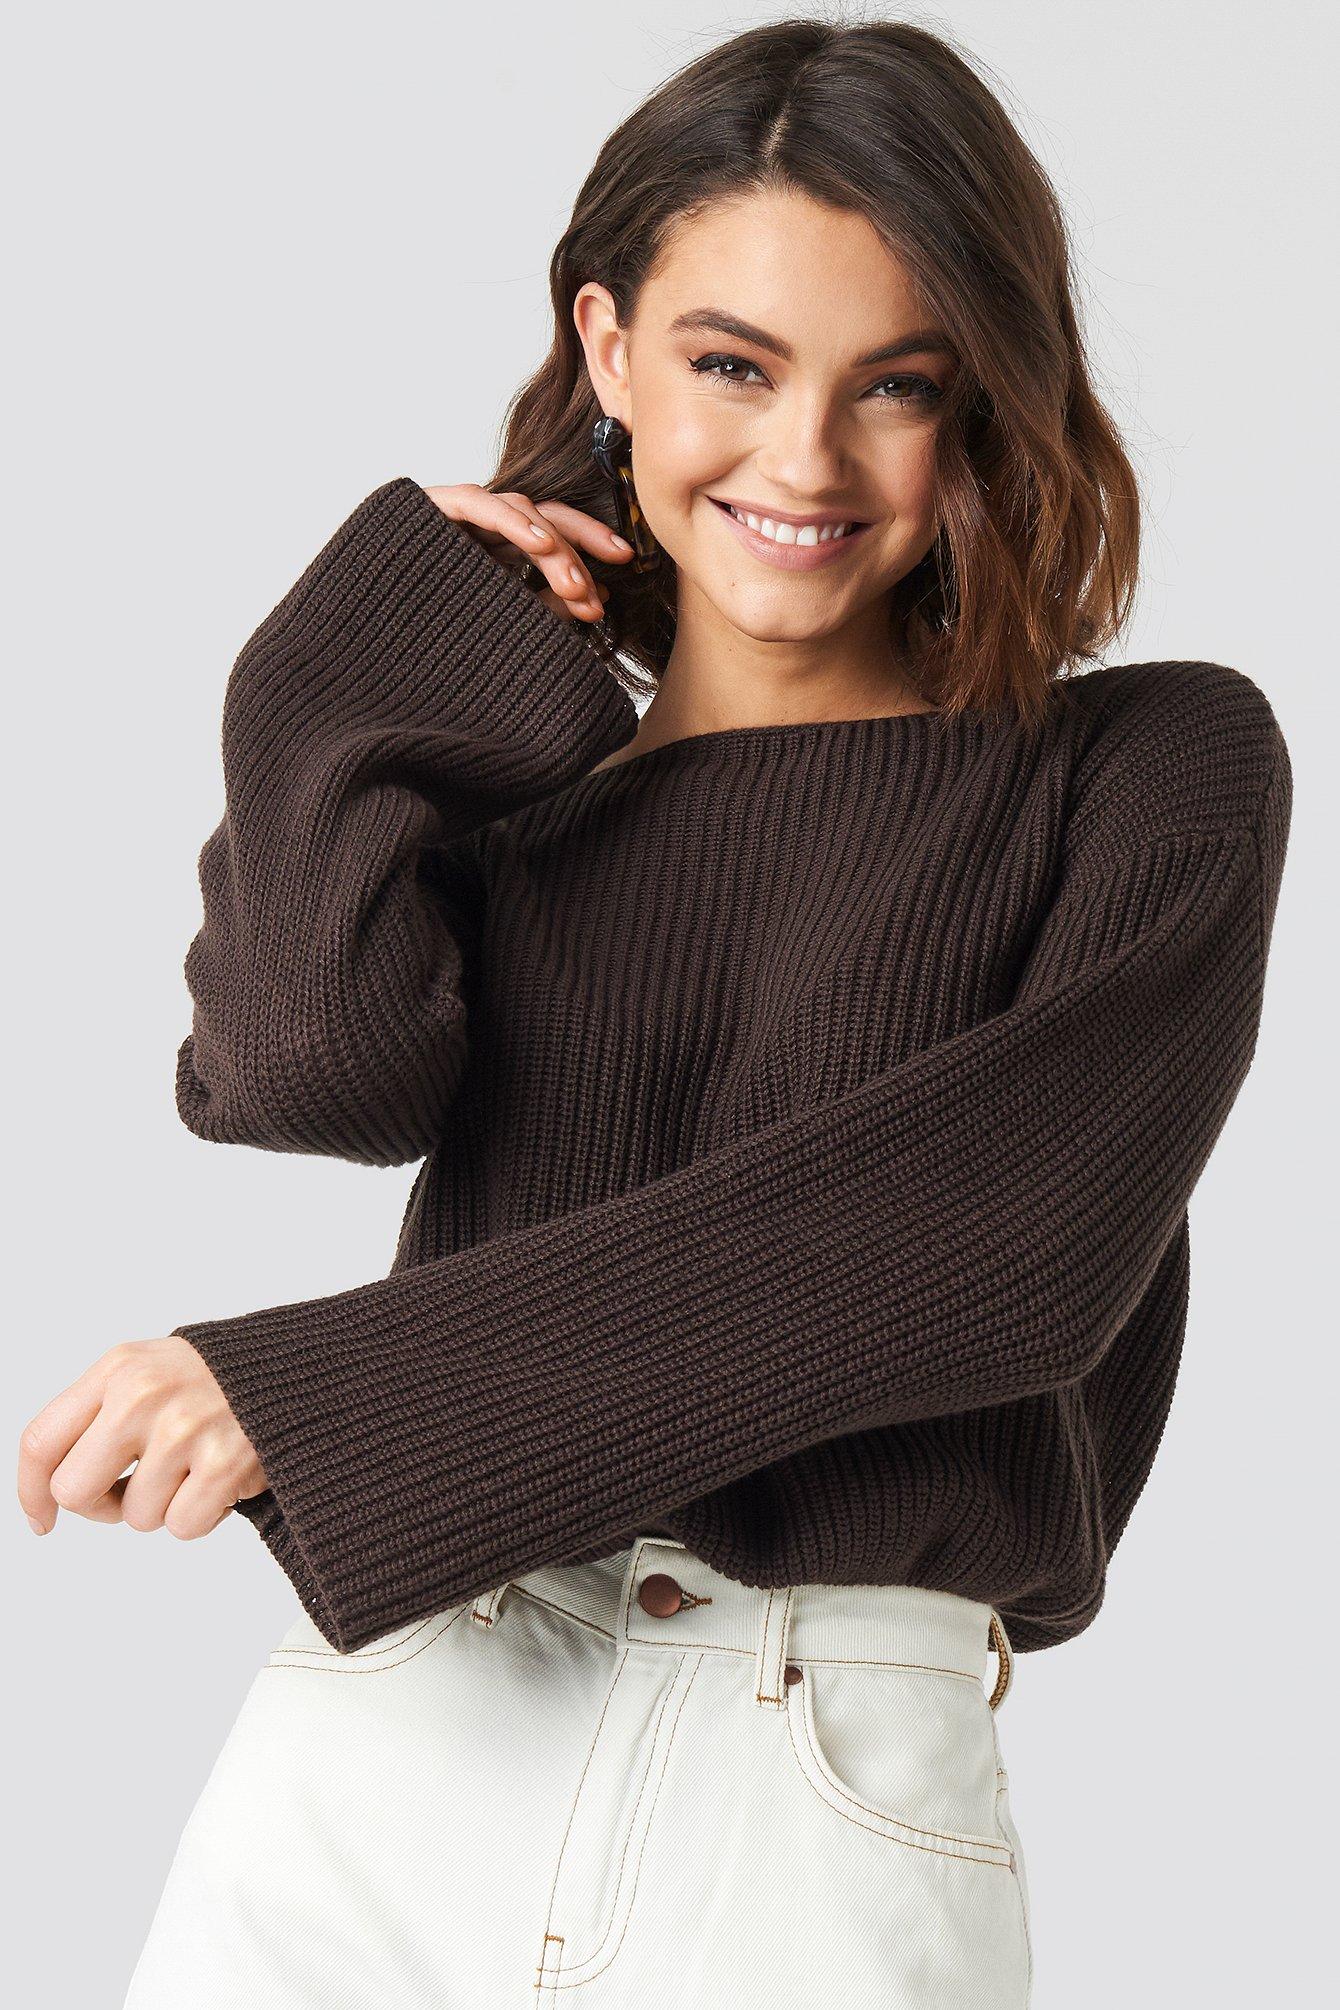 Ruffle Off Shoulder Knitted Sweater Beige   na-kd.com